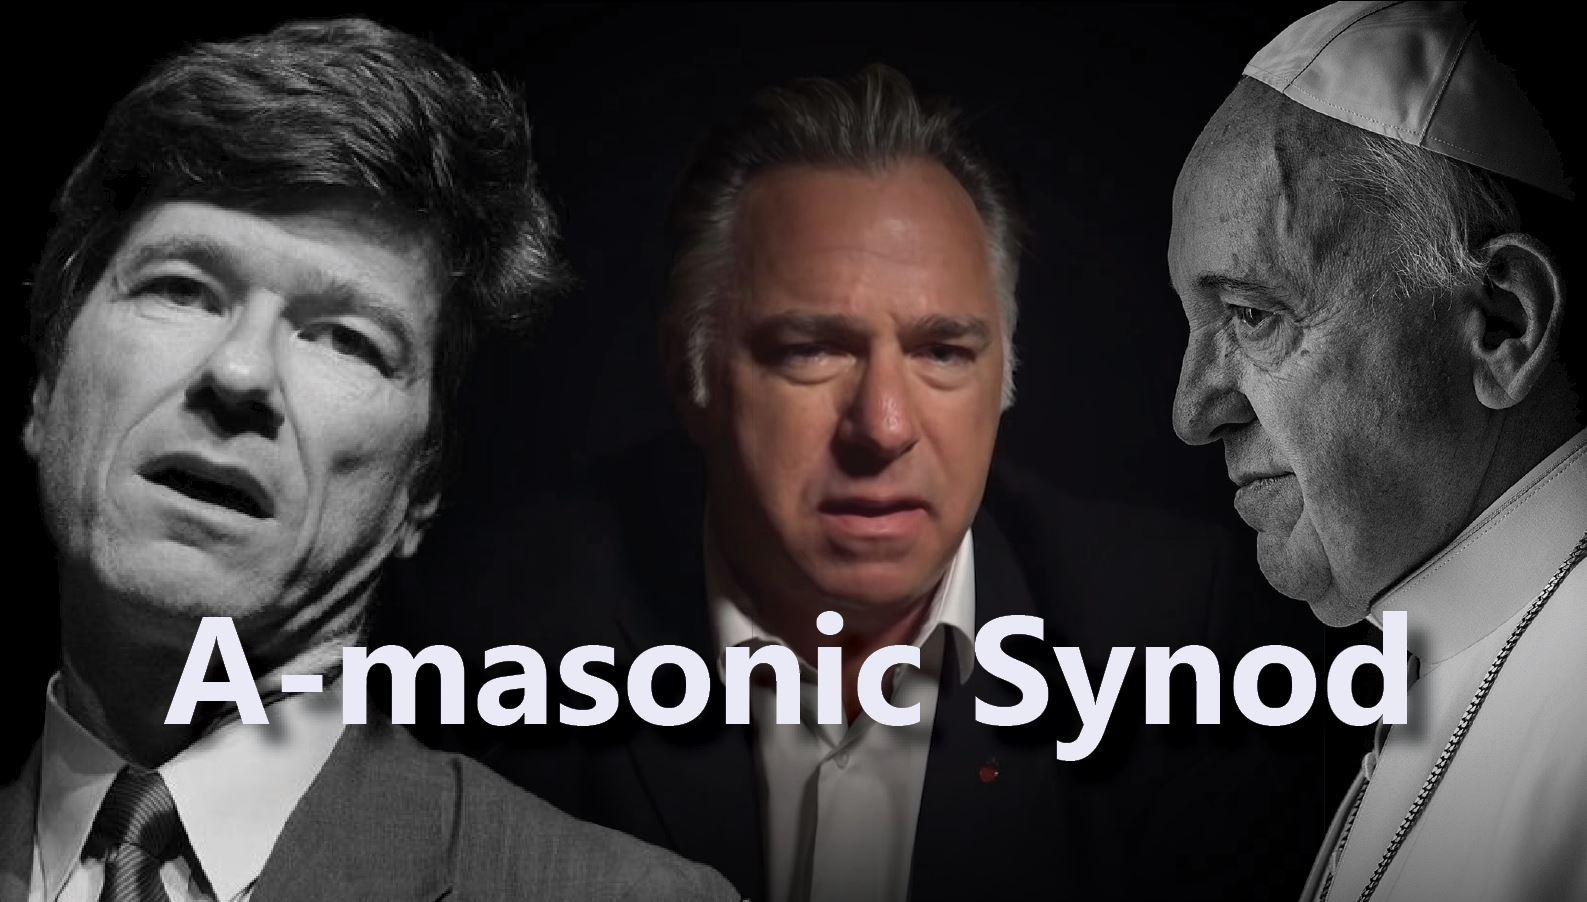 amasonic synod thumb